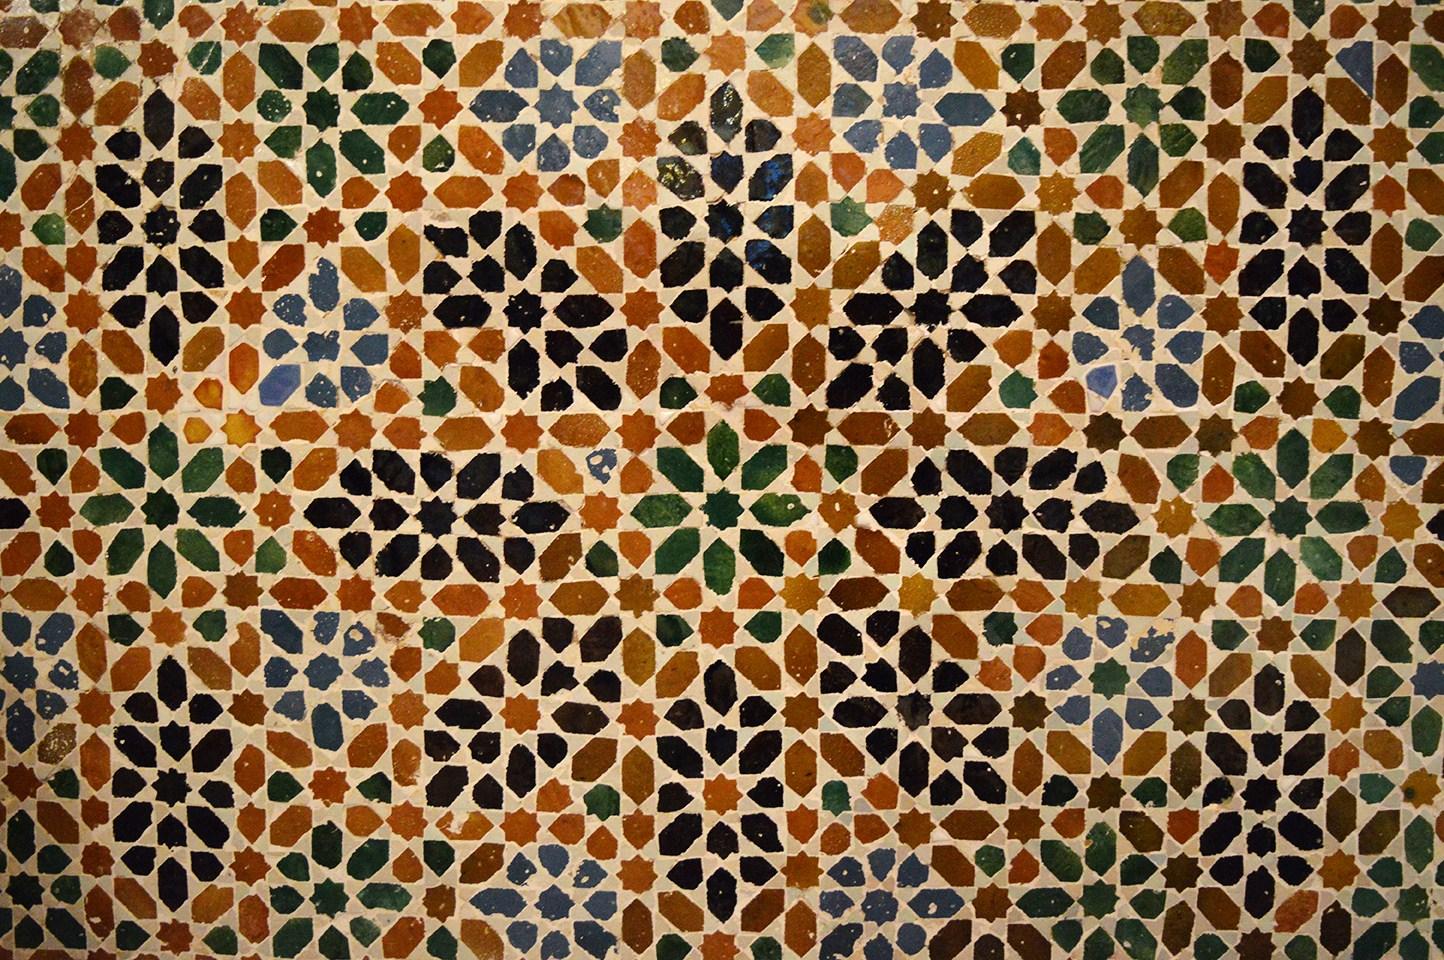 Azulejos de la mezquita de cordoba for Casa de azulejos cordoba